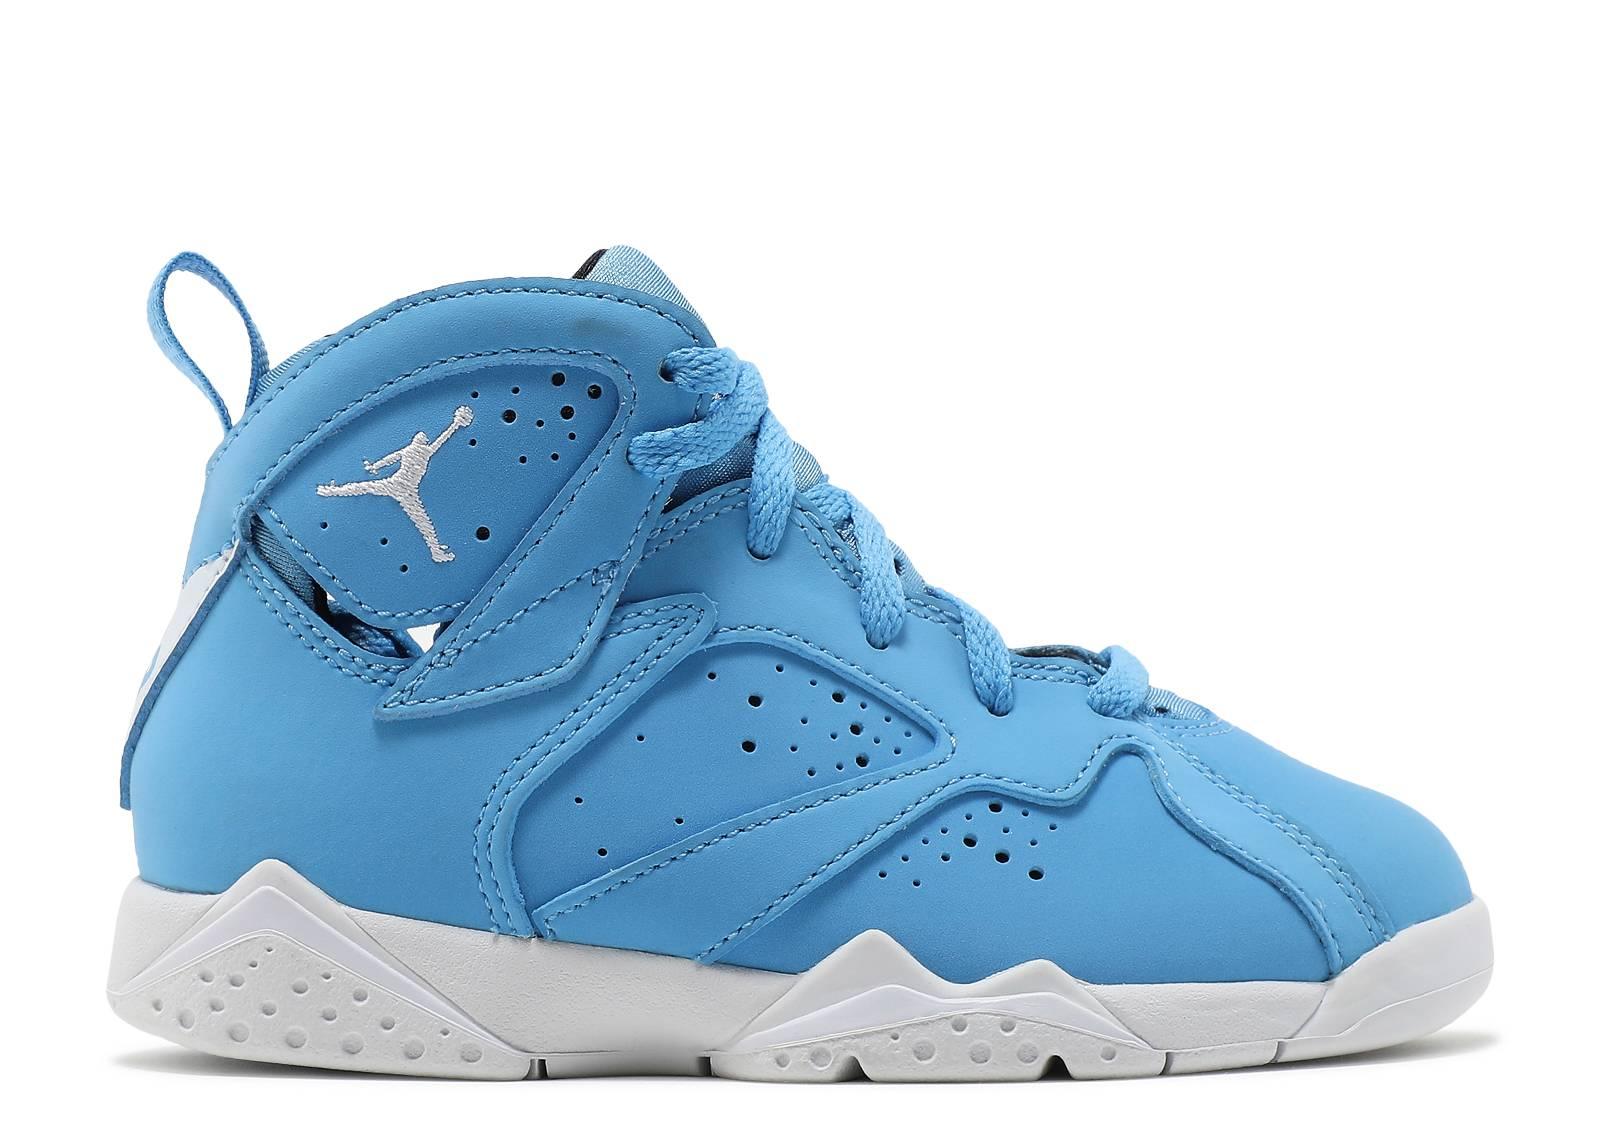 813867d6dcad Air Jordan 7 (VII) Shoes - Nike